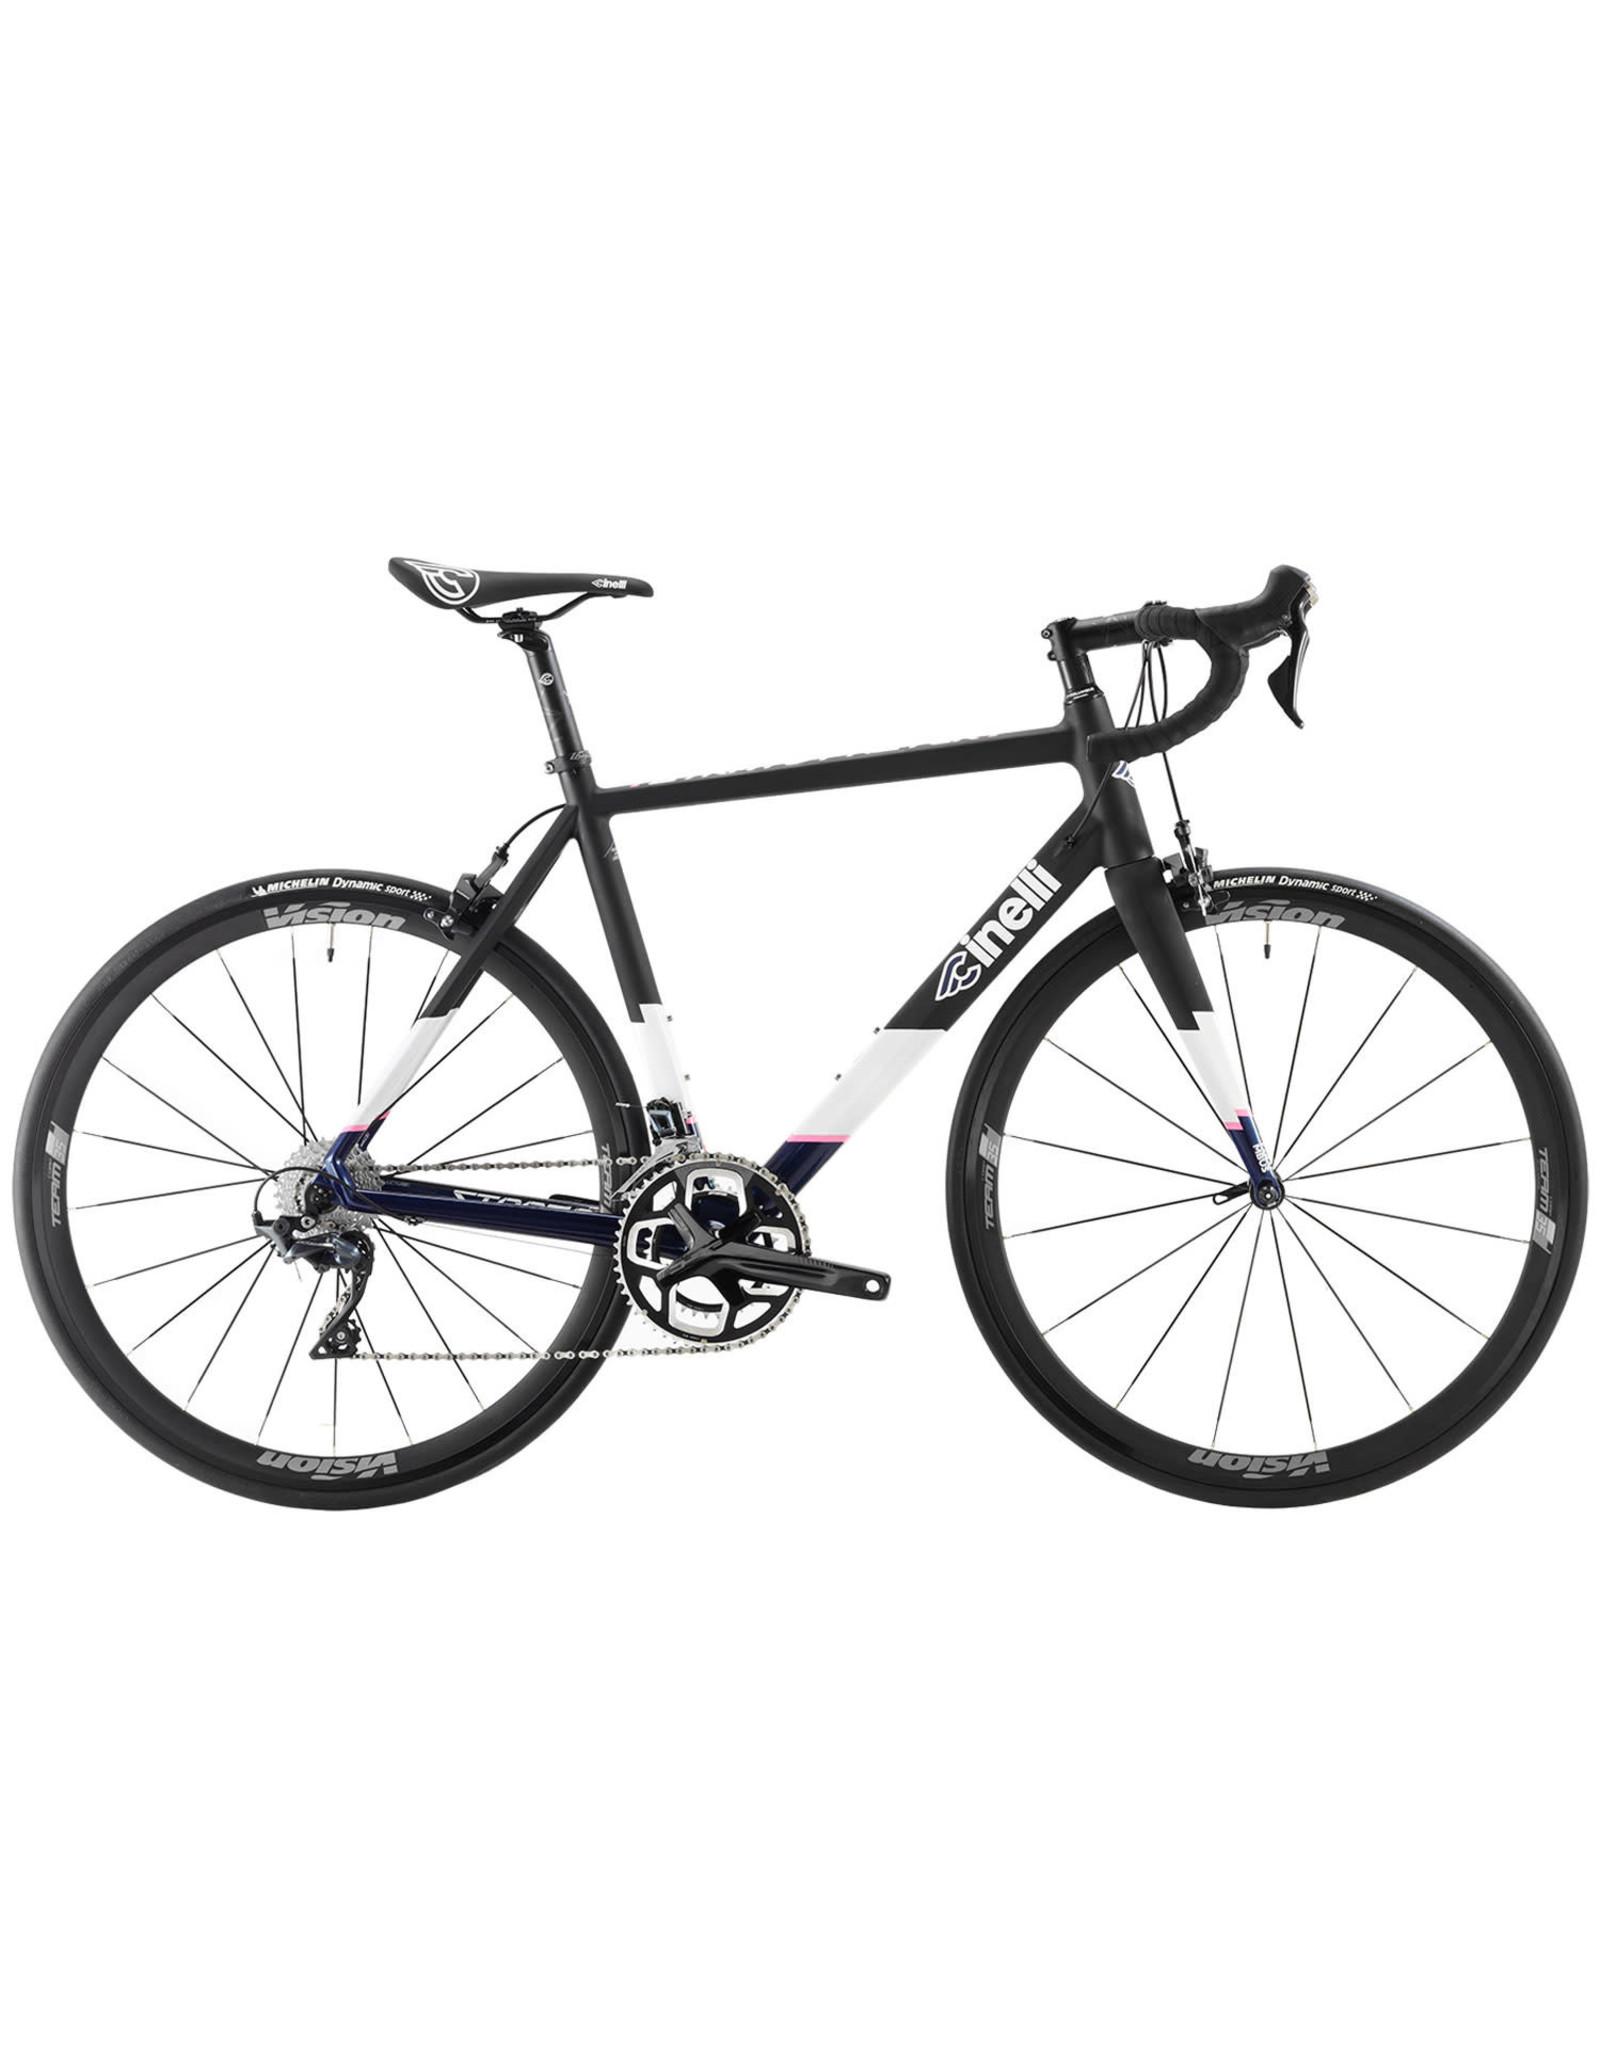 Cinelli Cinelli Strato Faster Potenza11 bike XS - ON SALE! WAS £2499